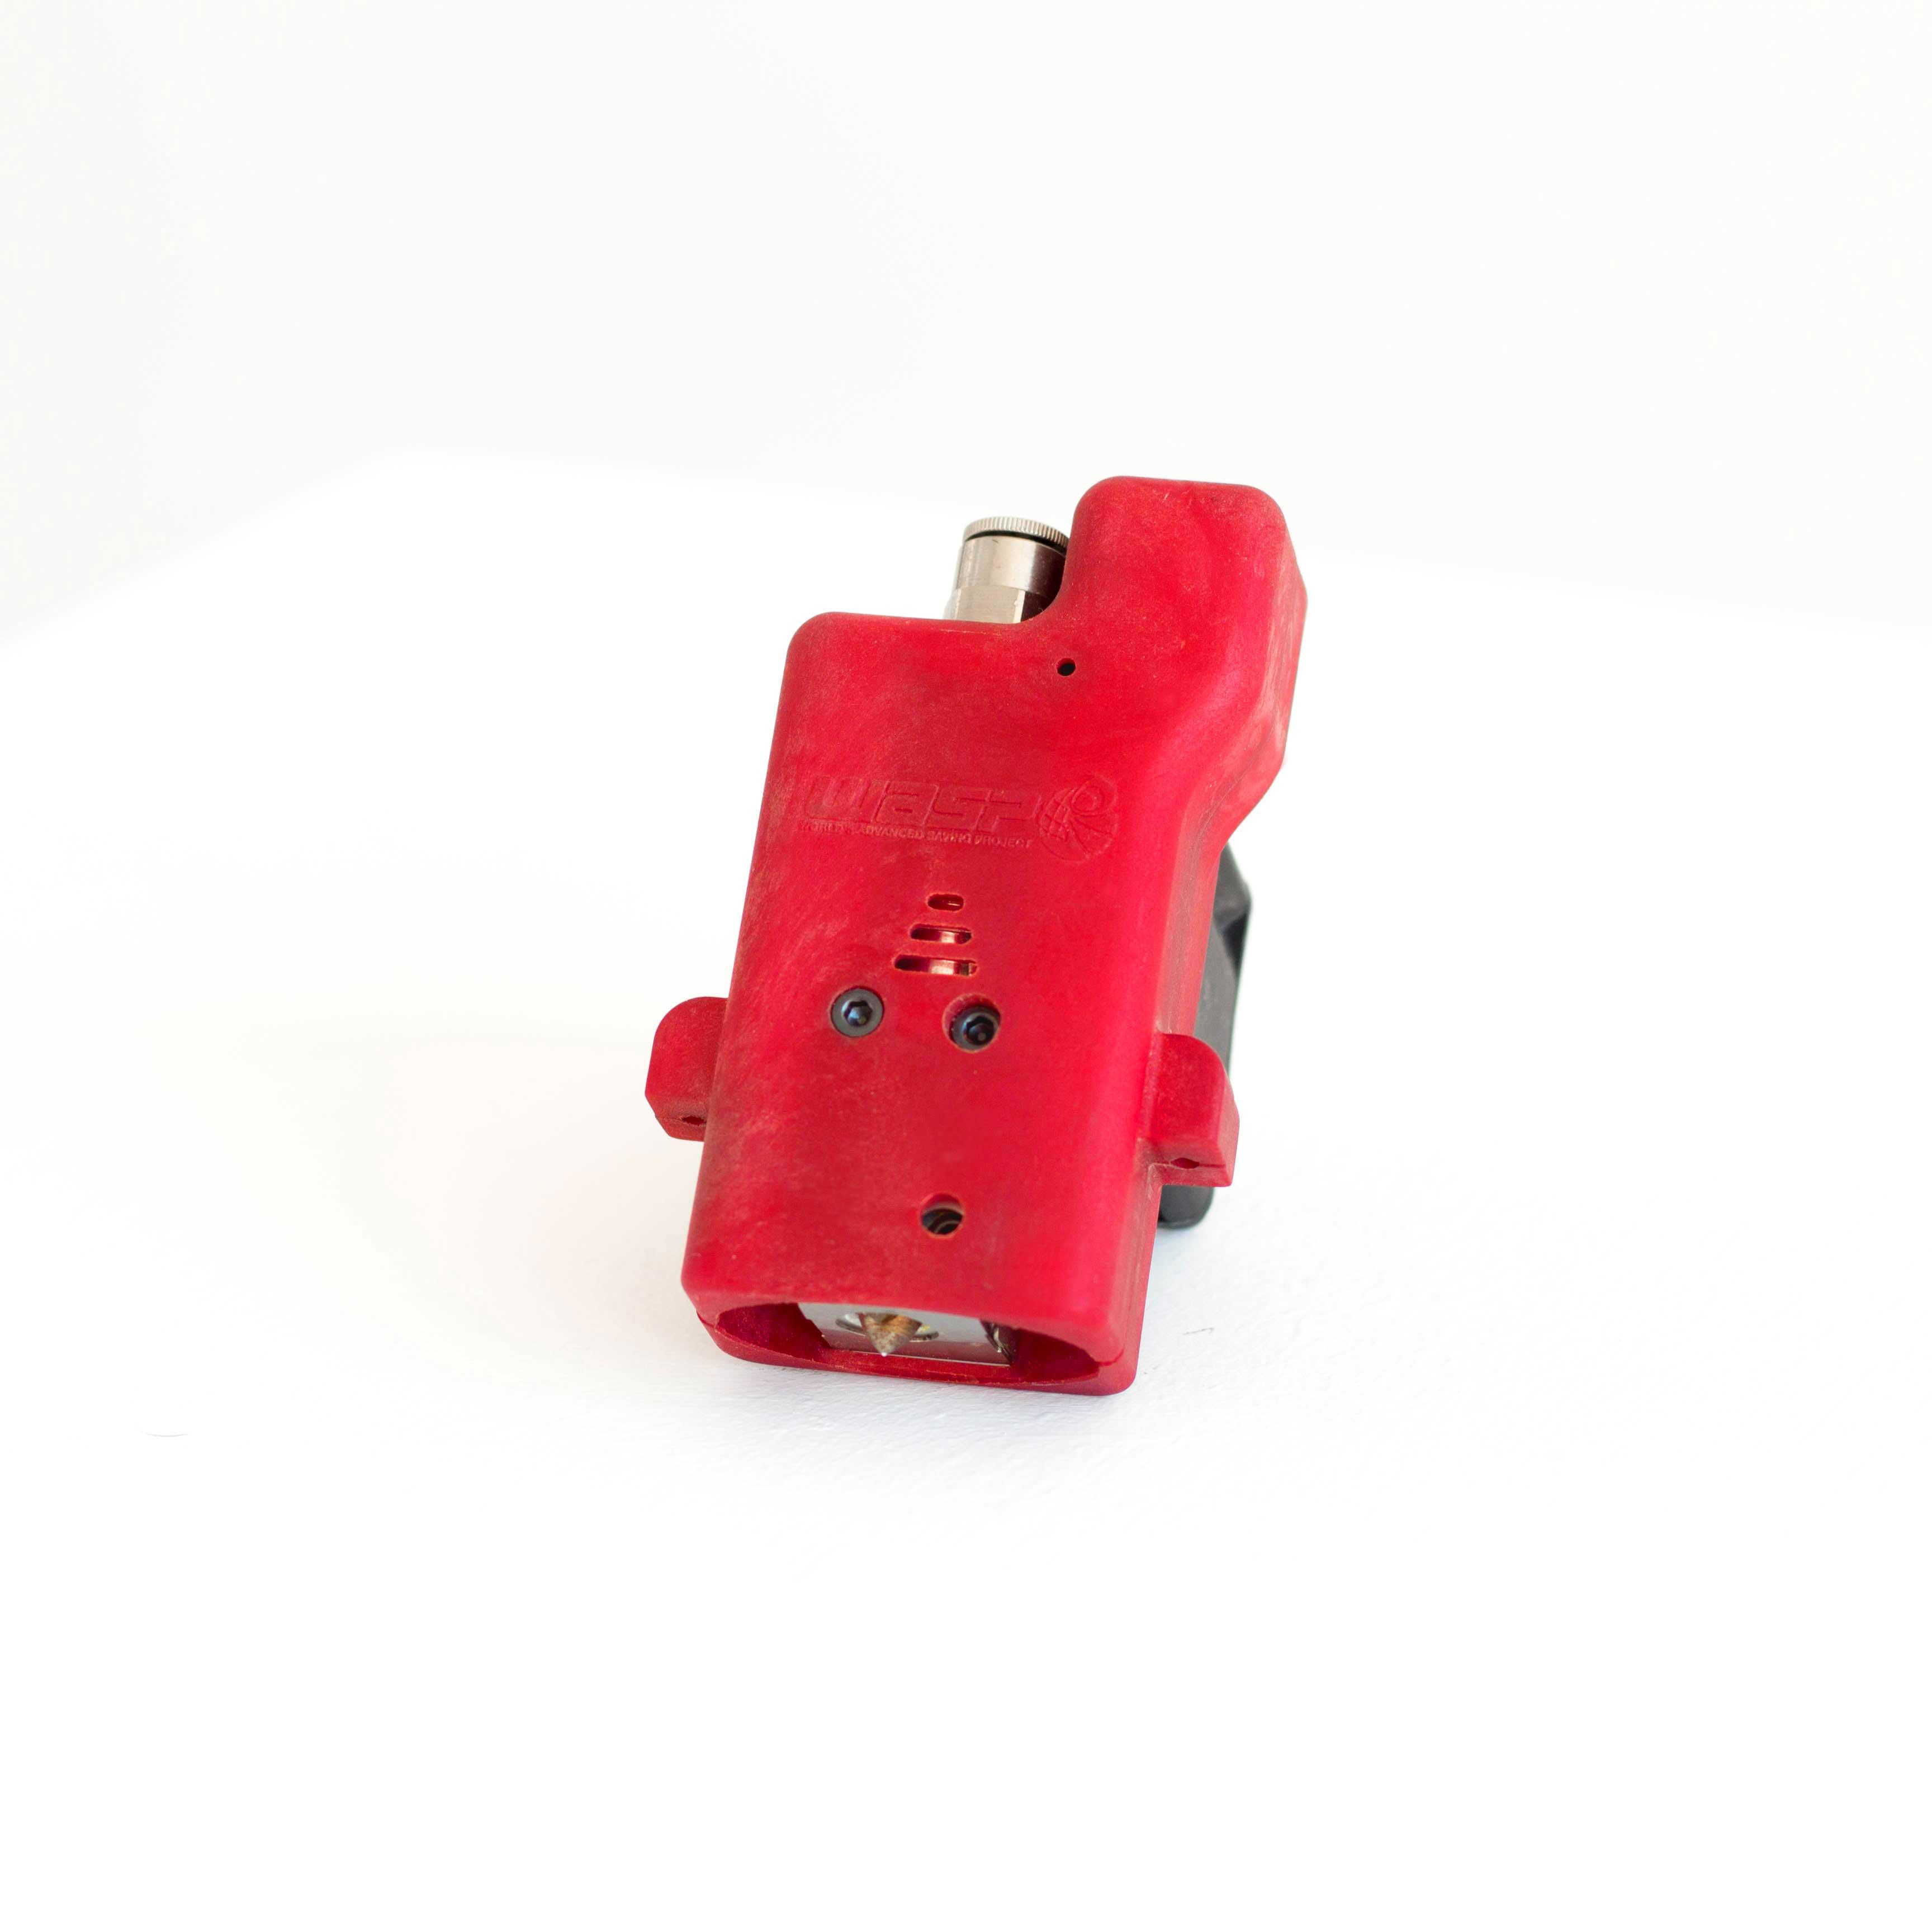 3d printer extruder - WASP SPITFIRE RED EXTEUDER